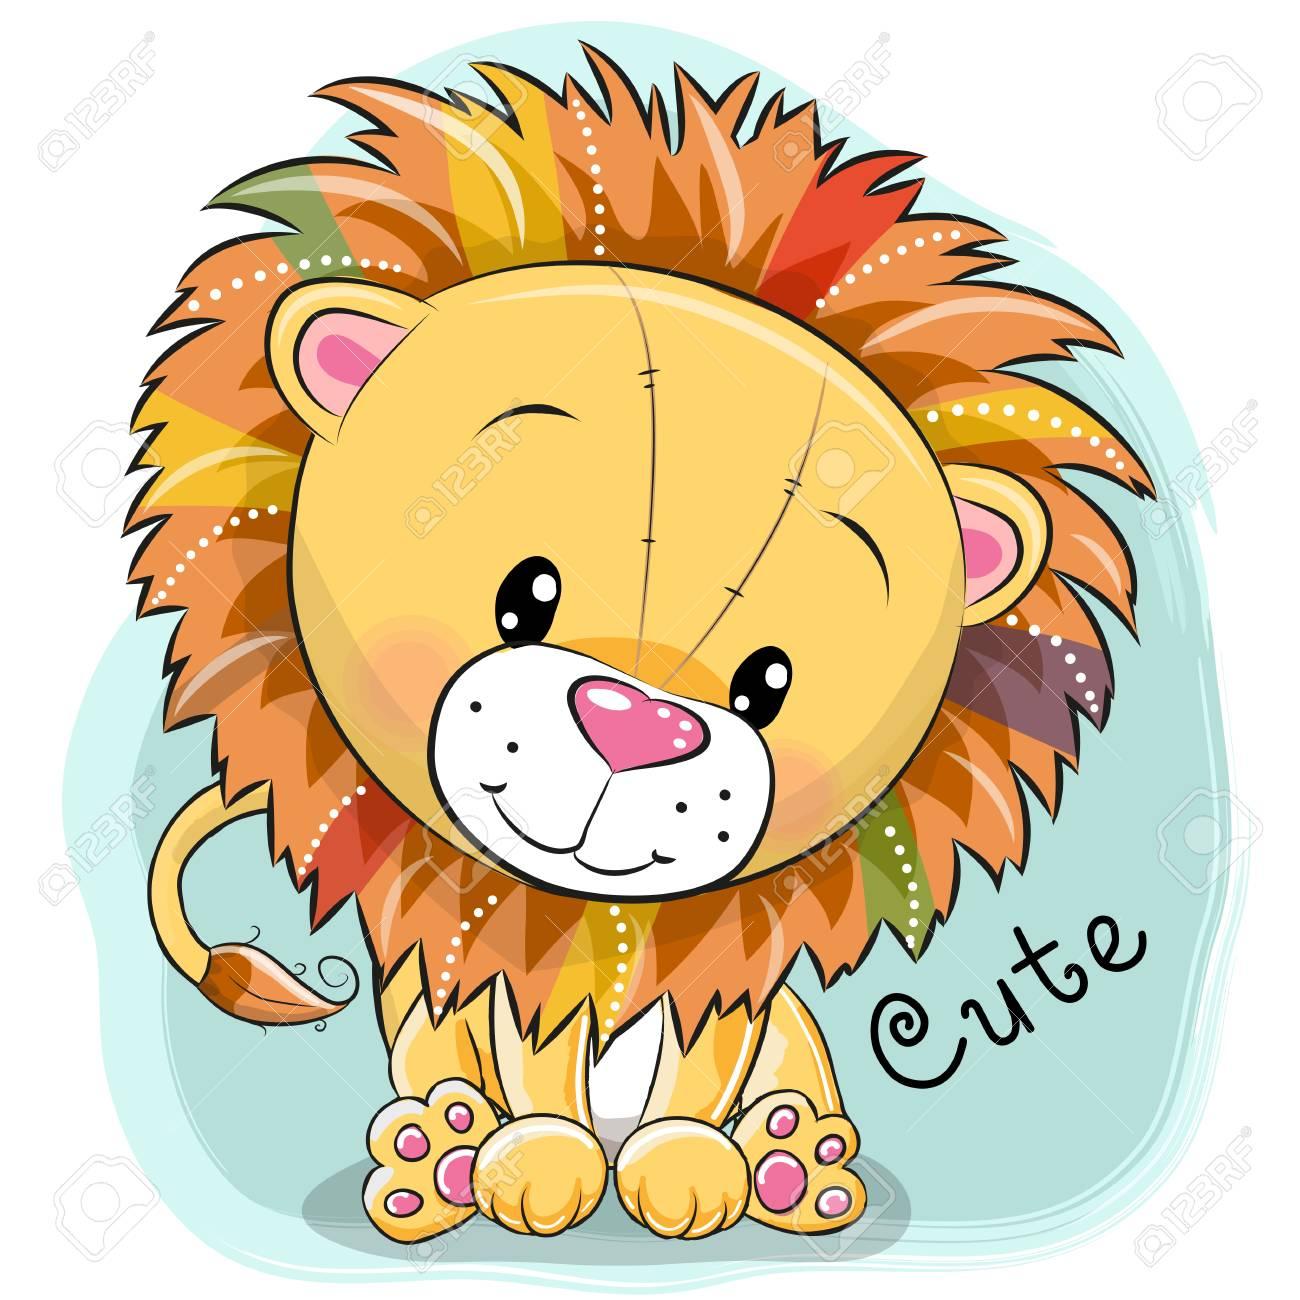 Cute cartoon lion on a blue background, vector illustration. - 89310770